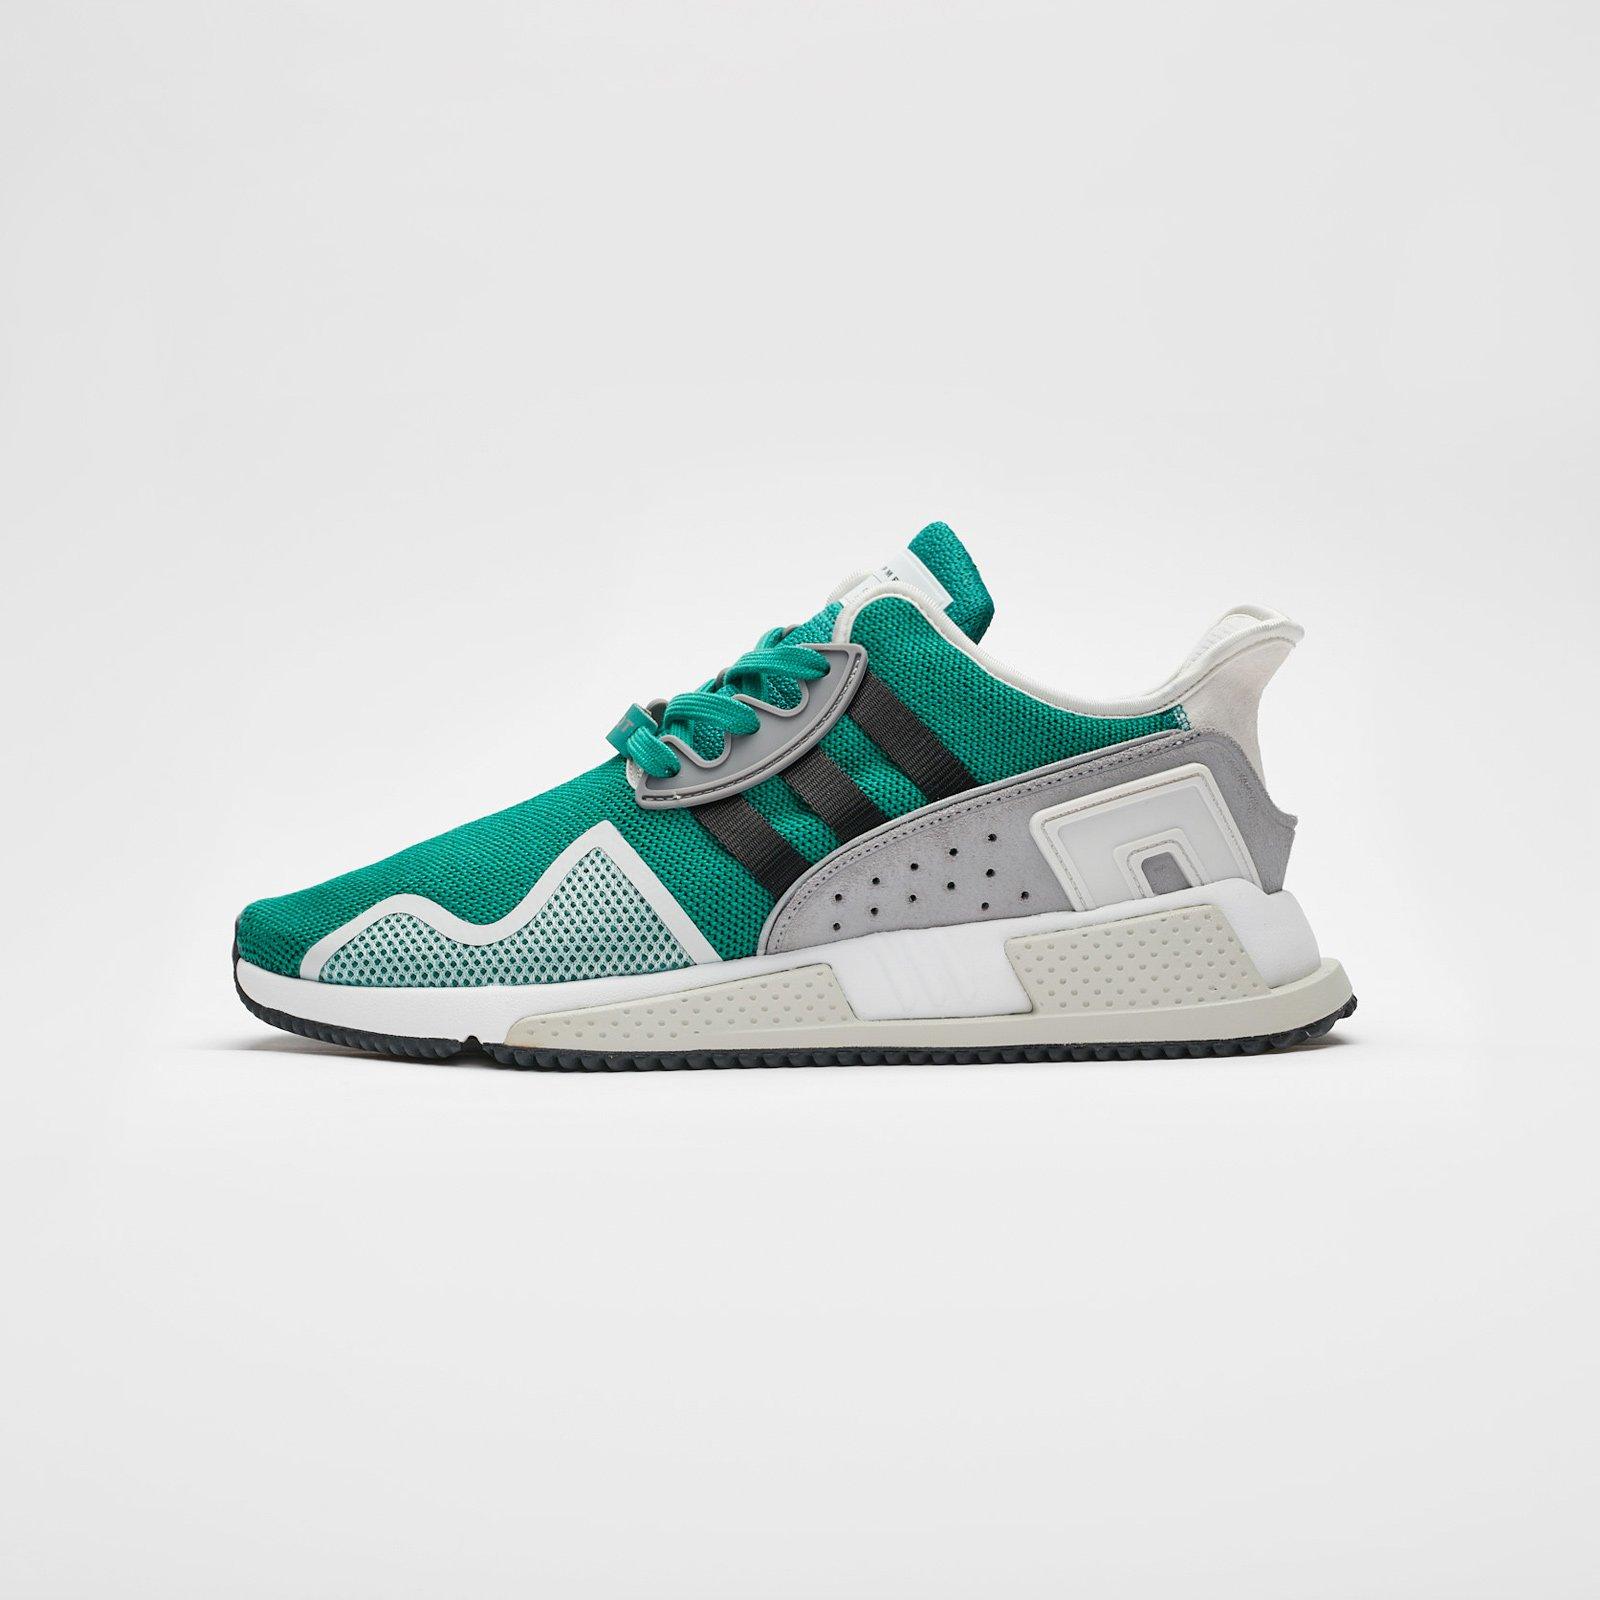 adidas EQT Cushion ADV - Bb7179 - SNS | sneakers & streetwear ...